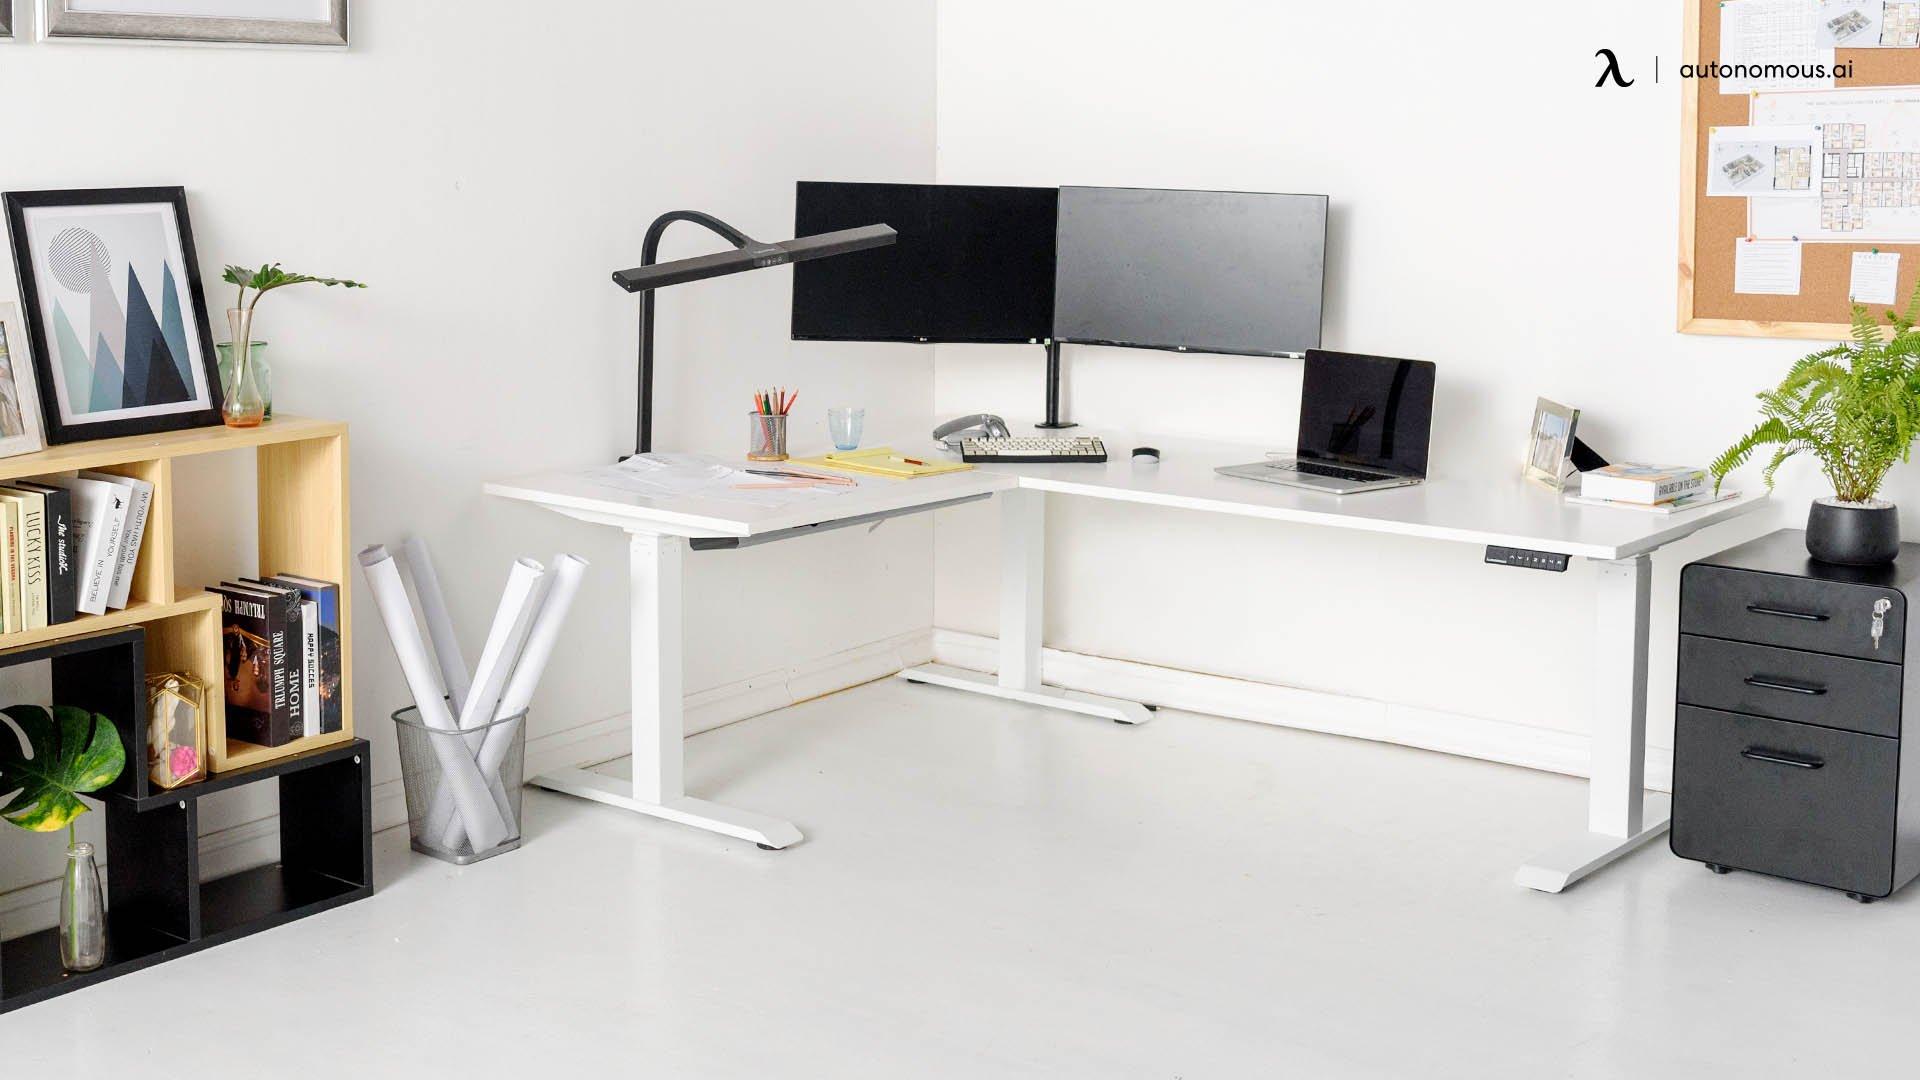 The Dual Monitor White Minimalist Setup